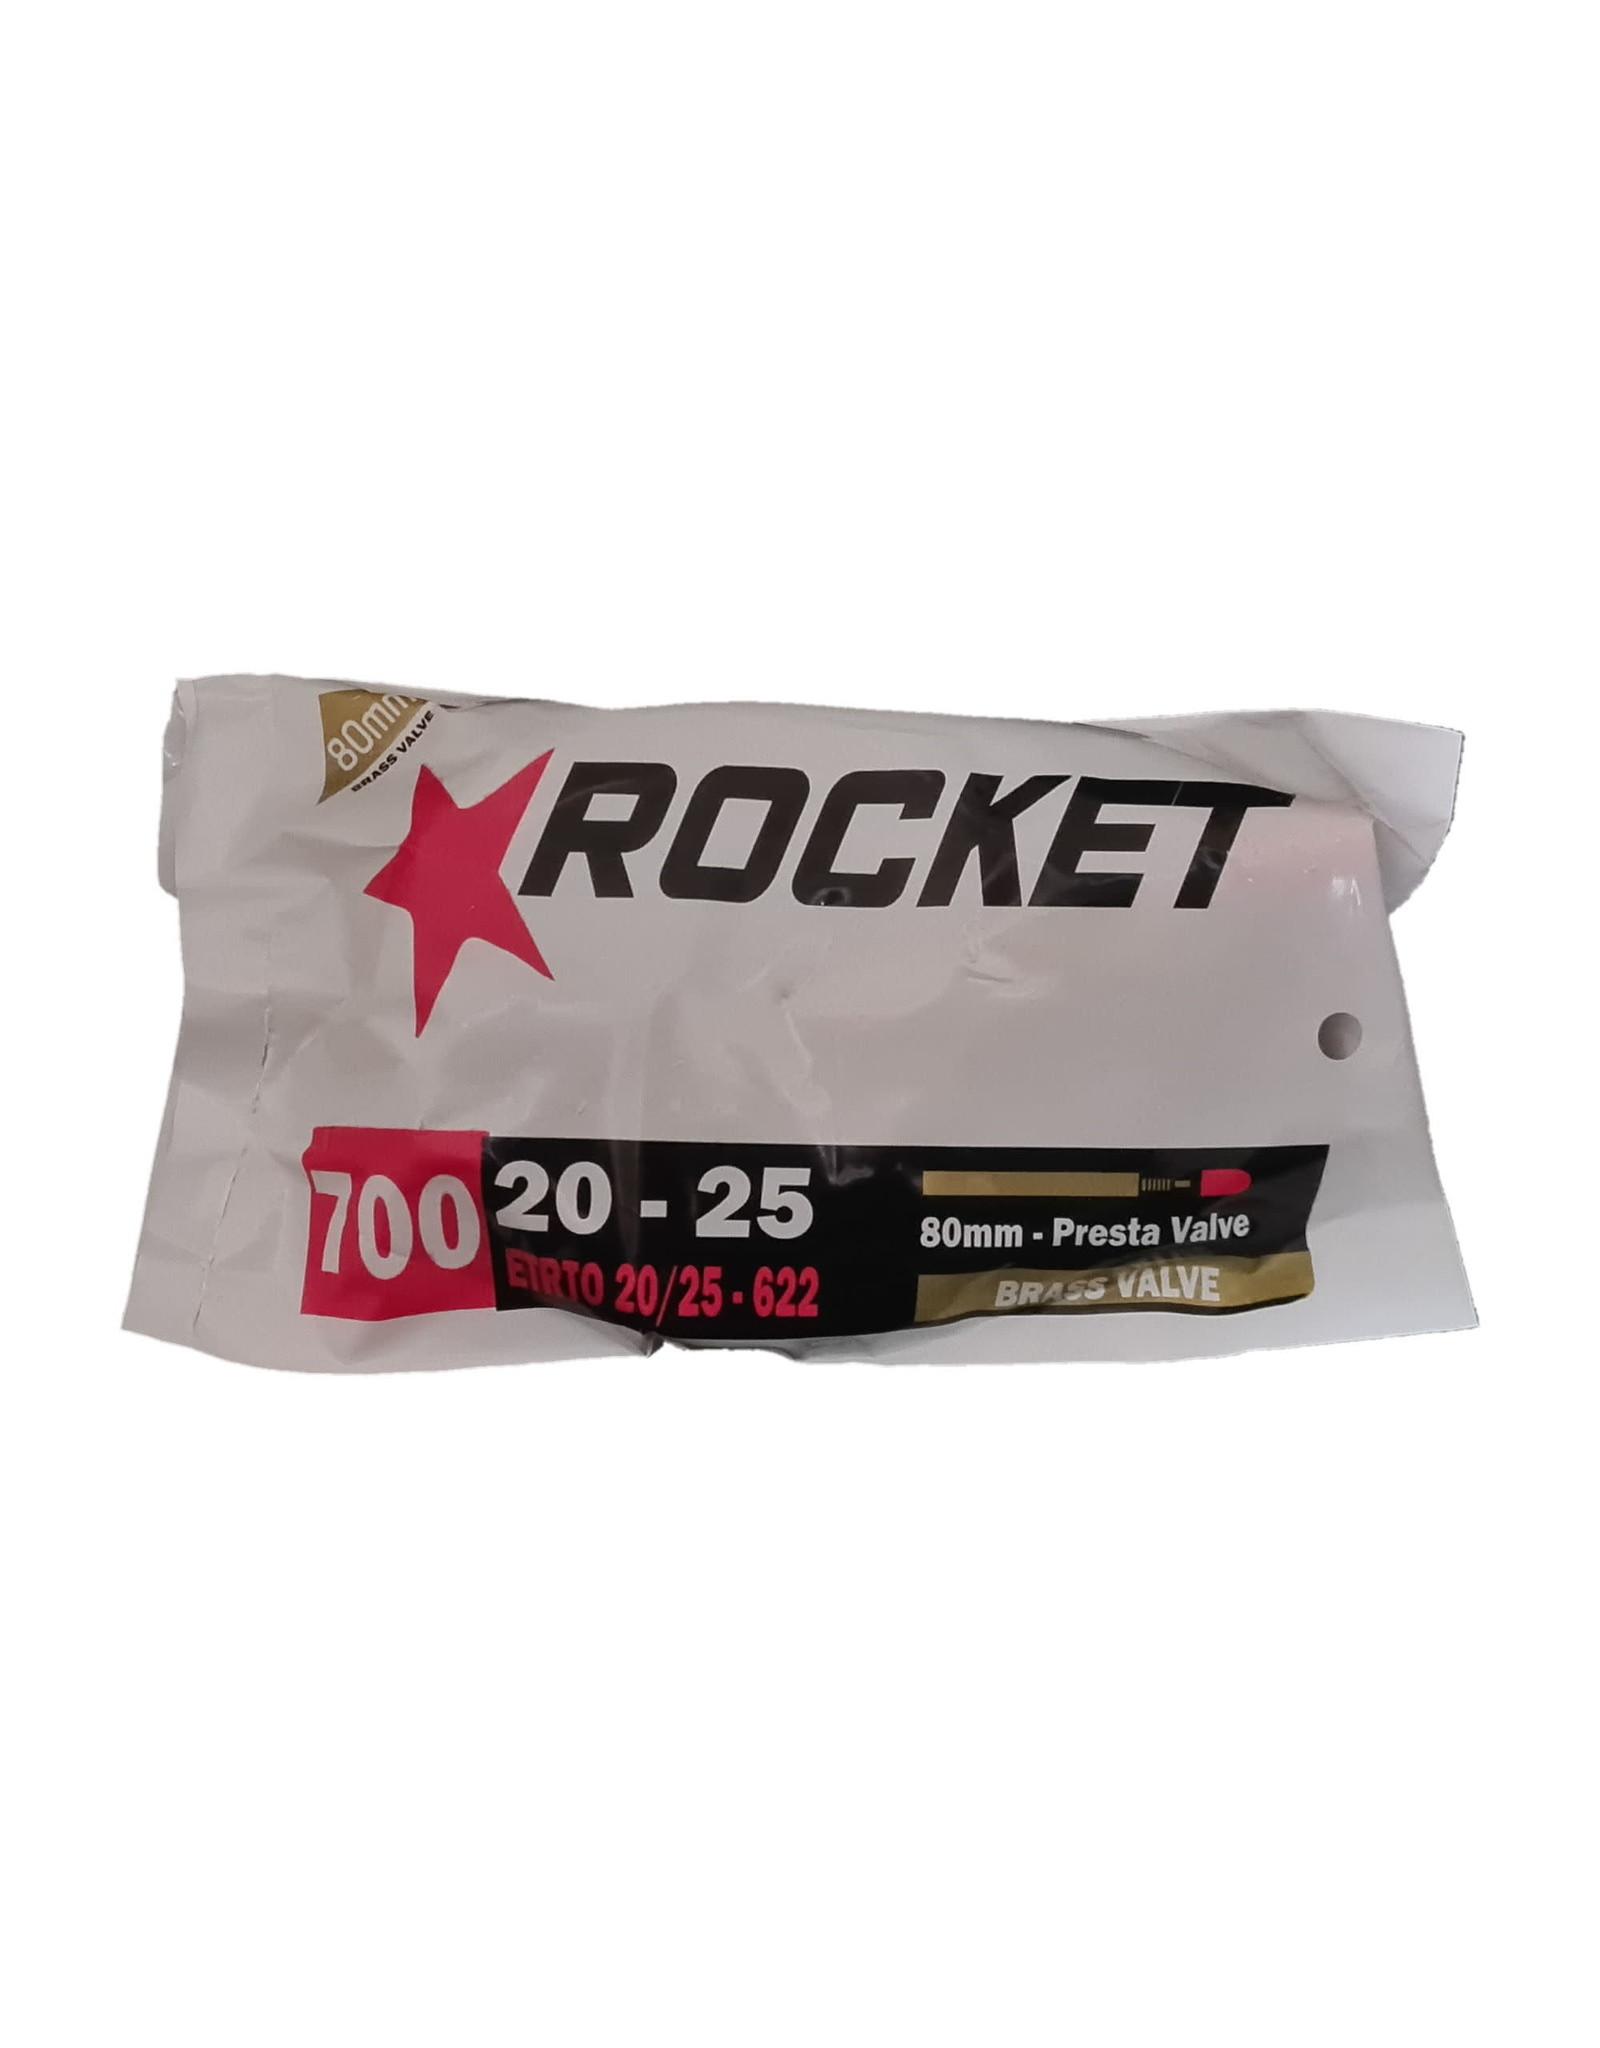 Rocket Butyl Inner Tube 700x20-25mm Brass Presta Valve